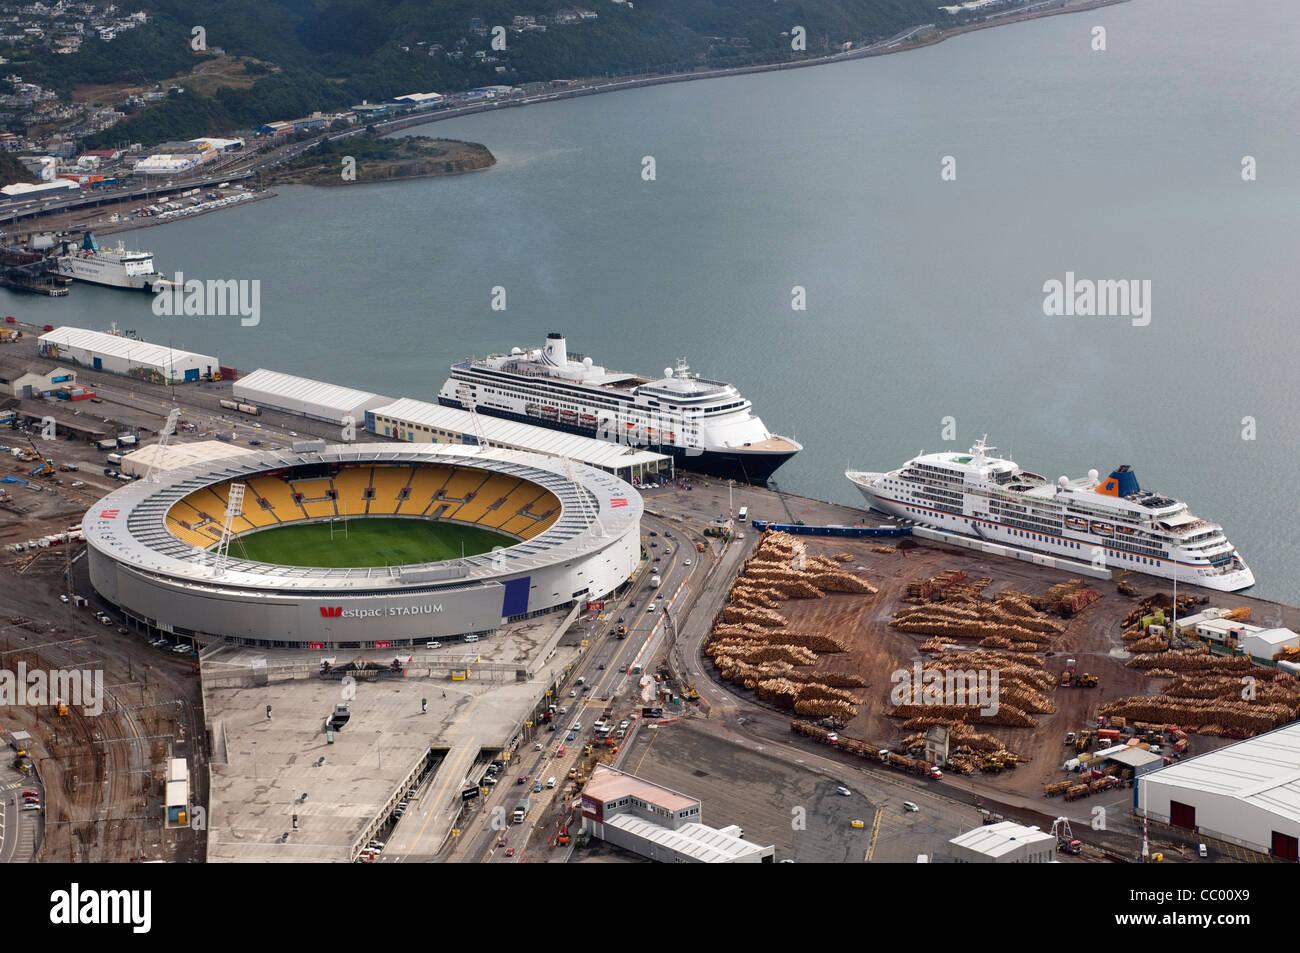 Cruise ships, Volendam and Europa docked beside the Westpac sports stadium in Wellington New Zealand. - Stock Image